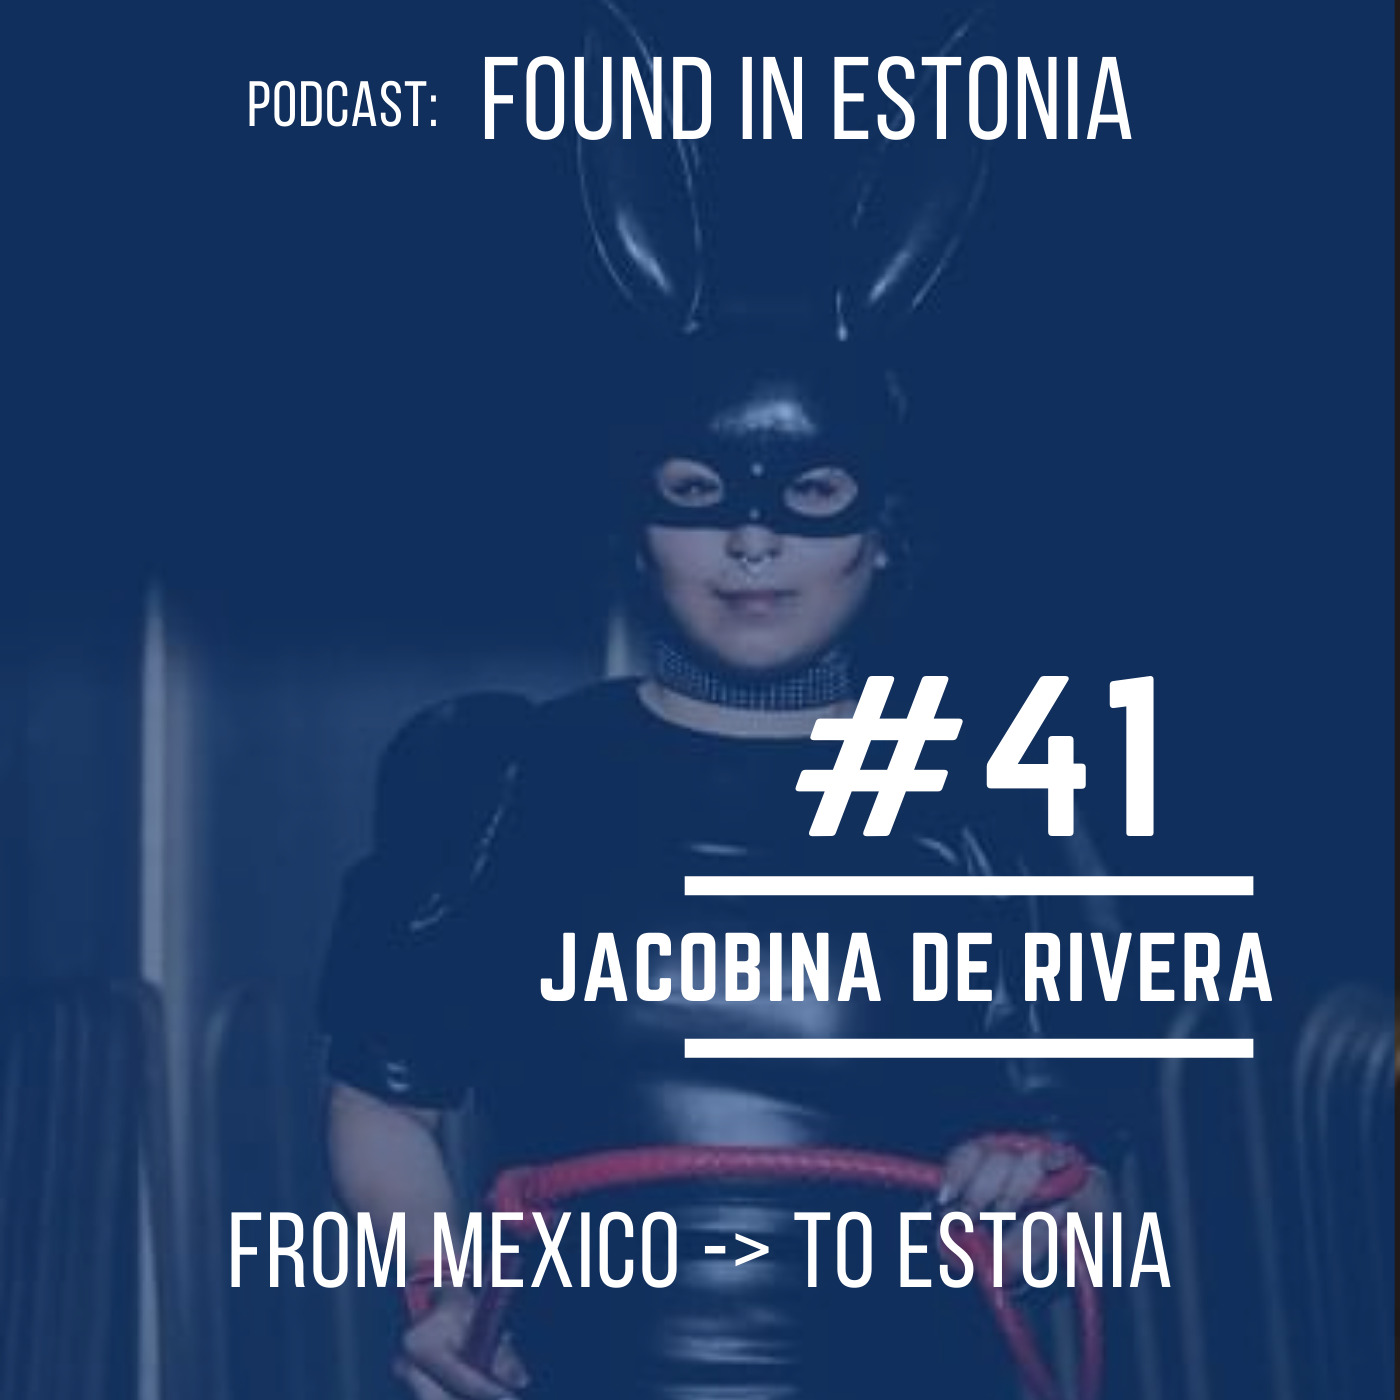 #41 Jacobina de Rivera from Mexico to Estonia